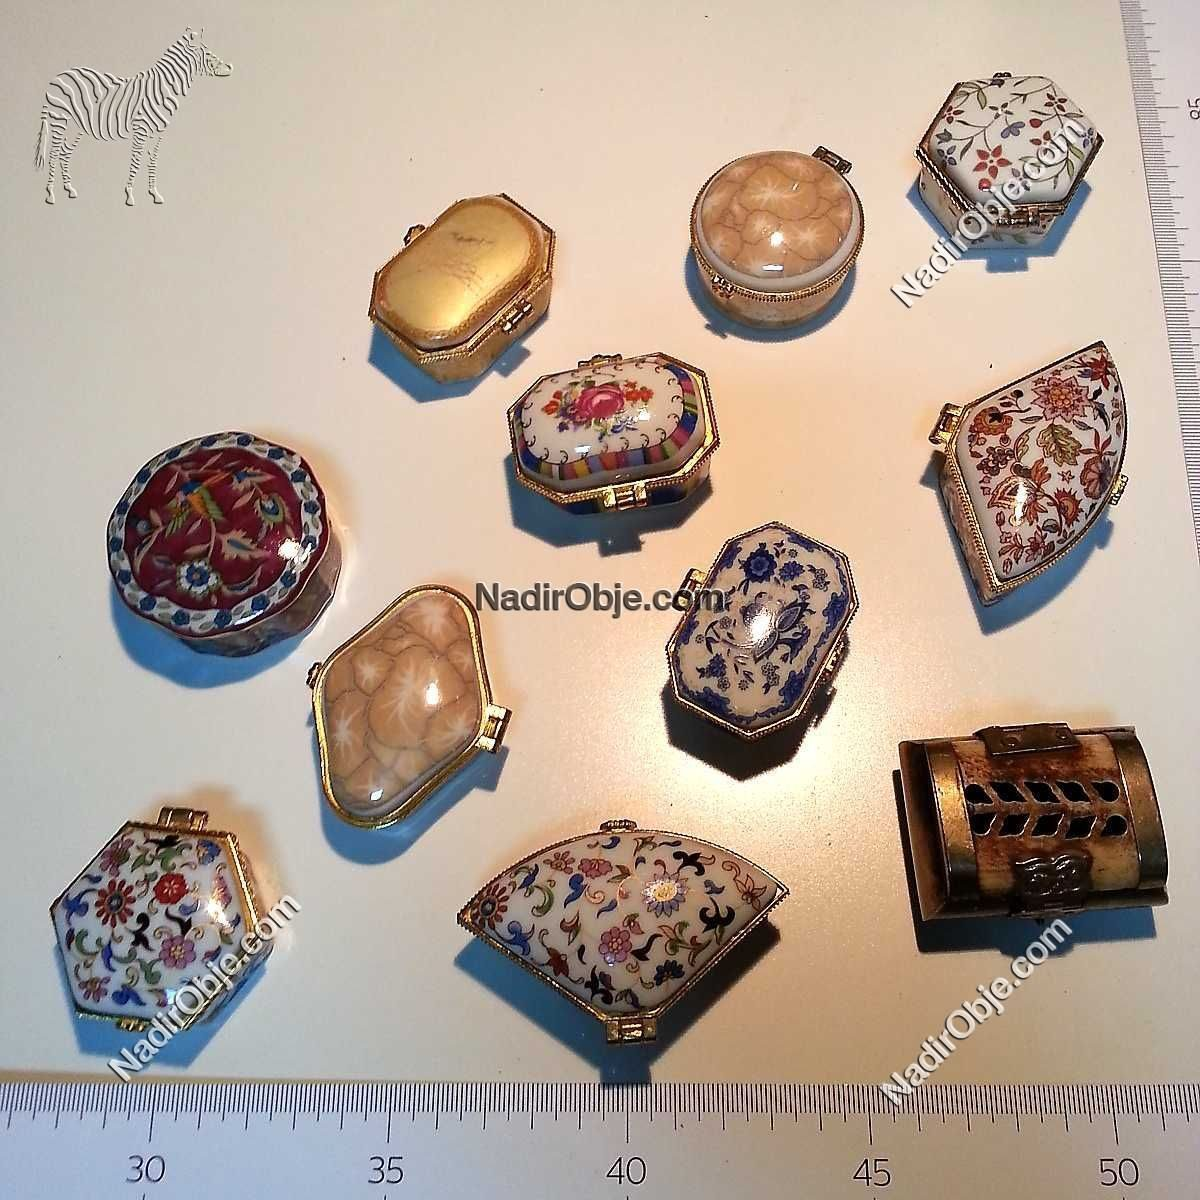 Porselen Kutu Lotu Seçtiklerimiz Kutu